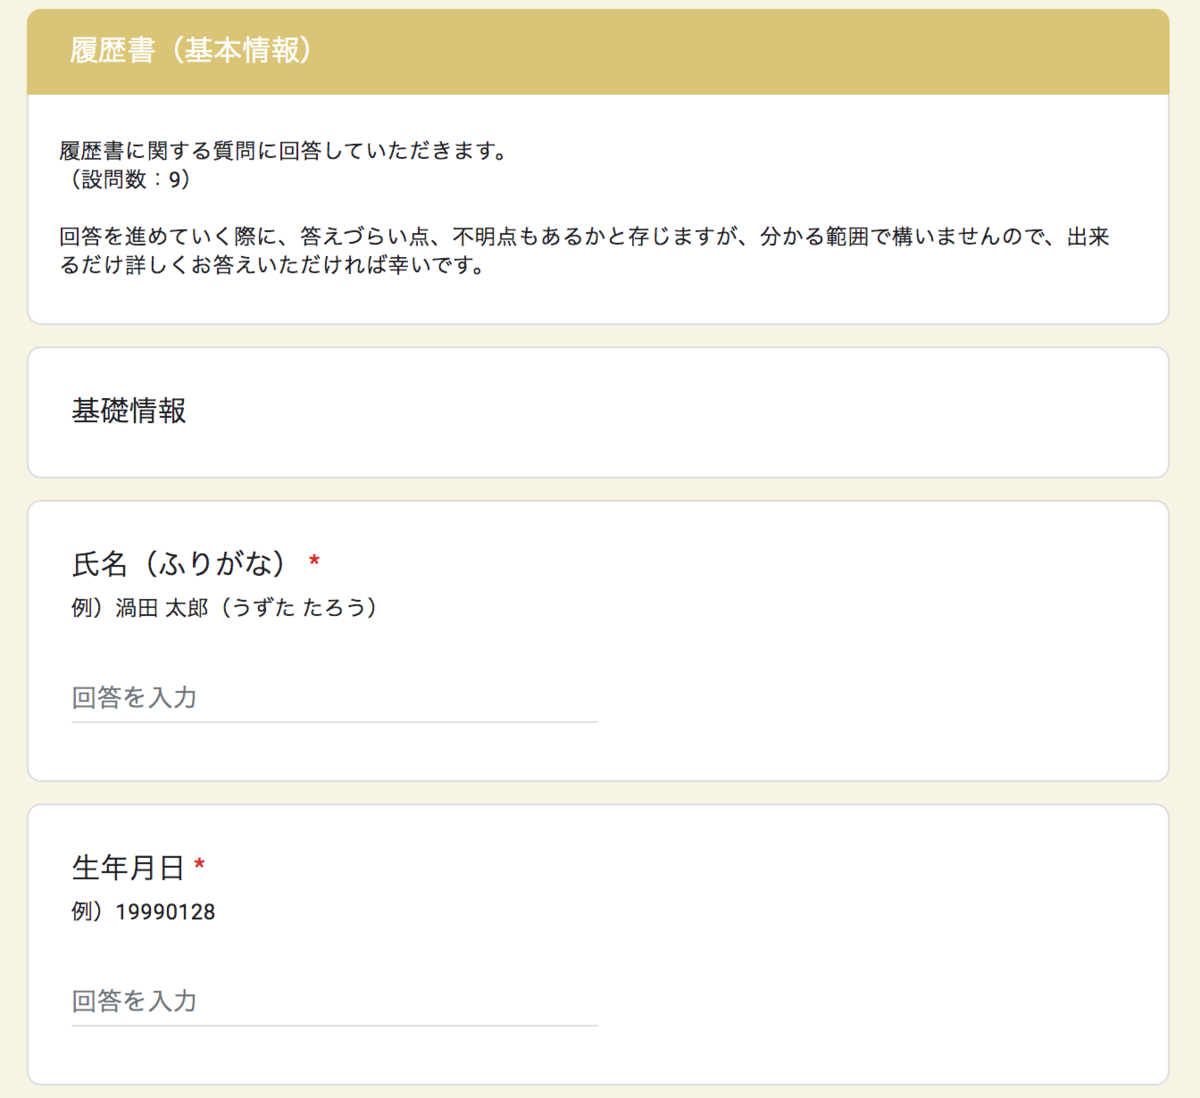 UZUZの履歴書記入Googleフォーム